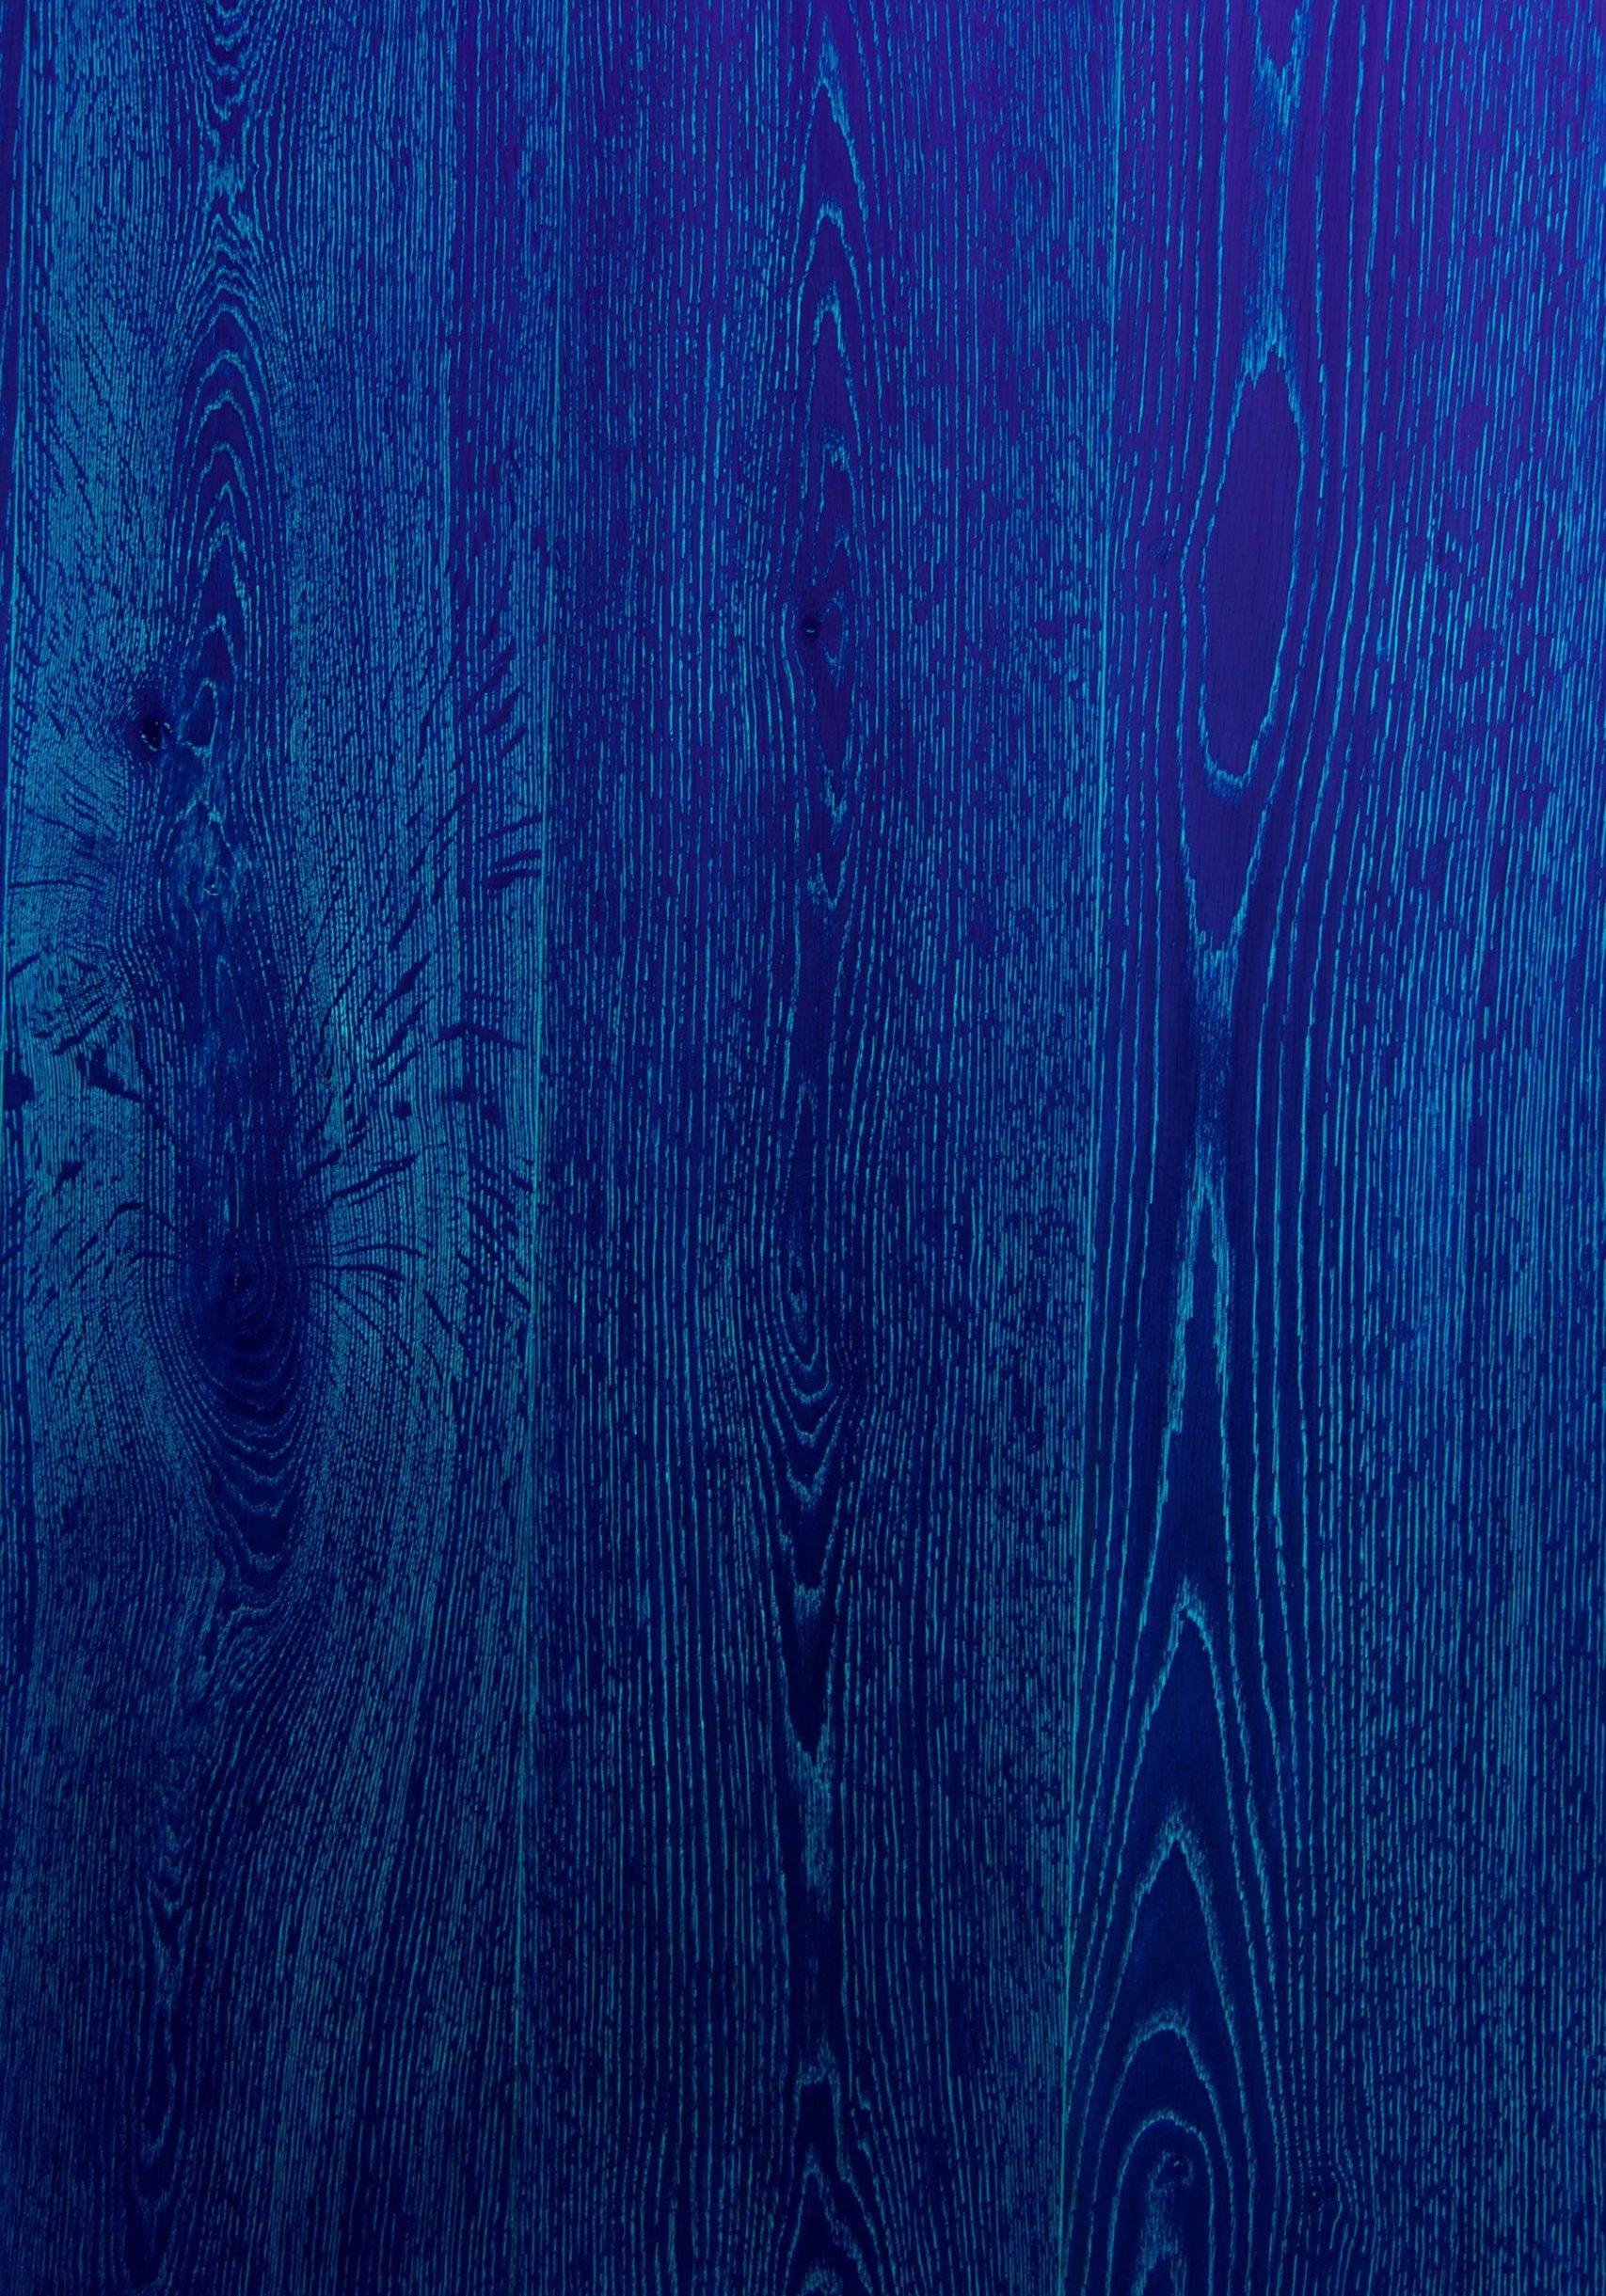 Glowood Timber UV Light